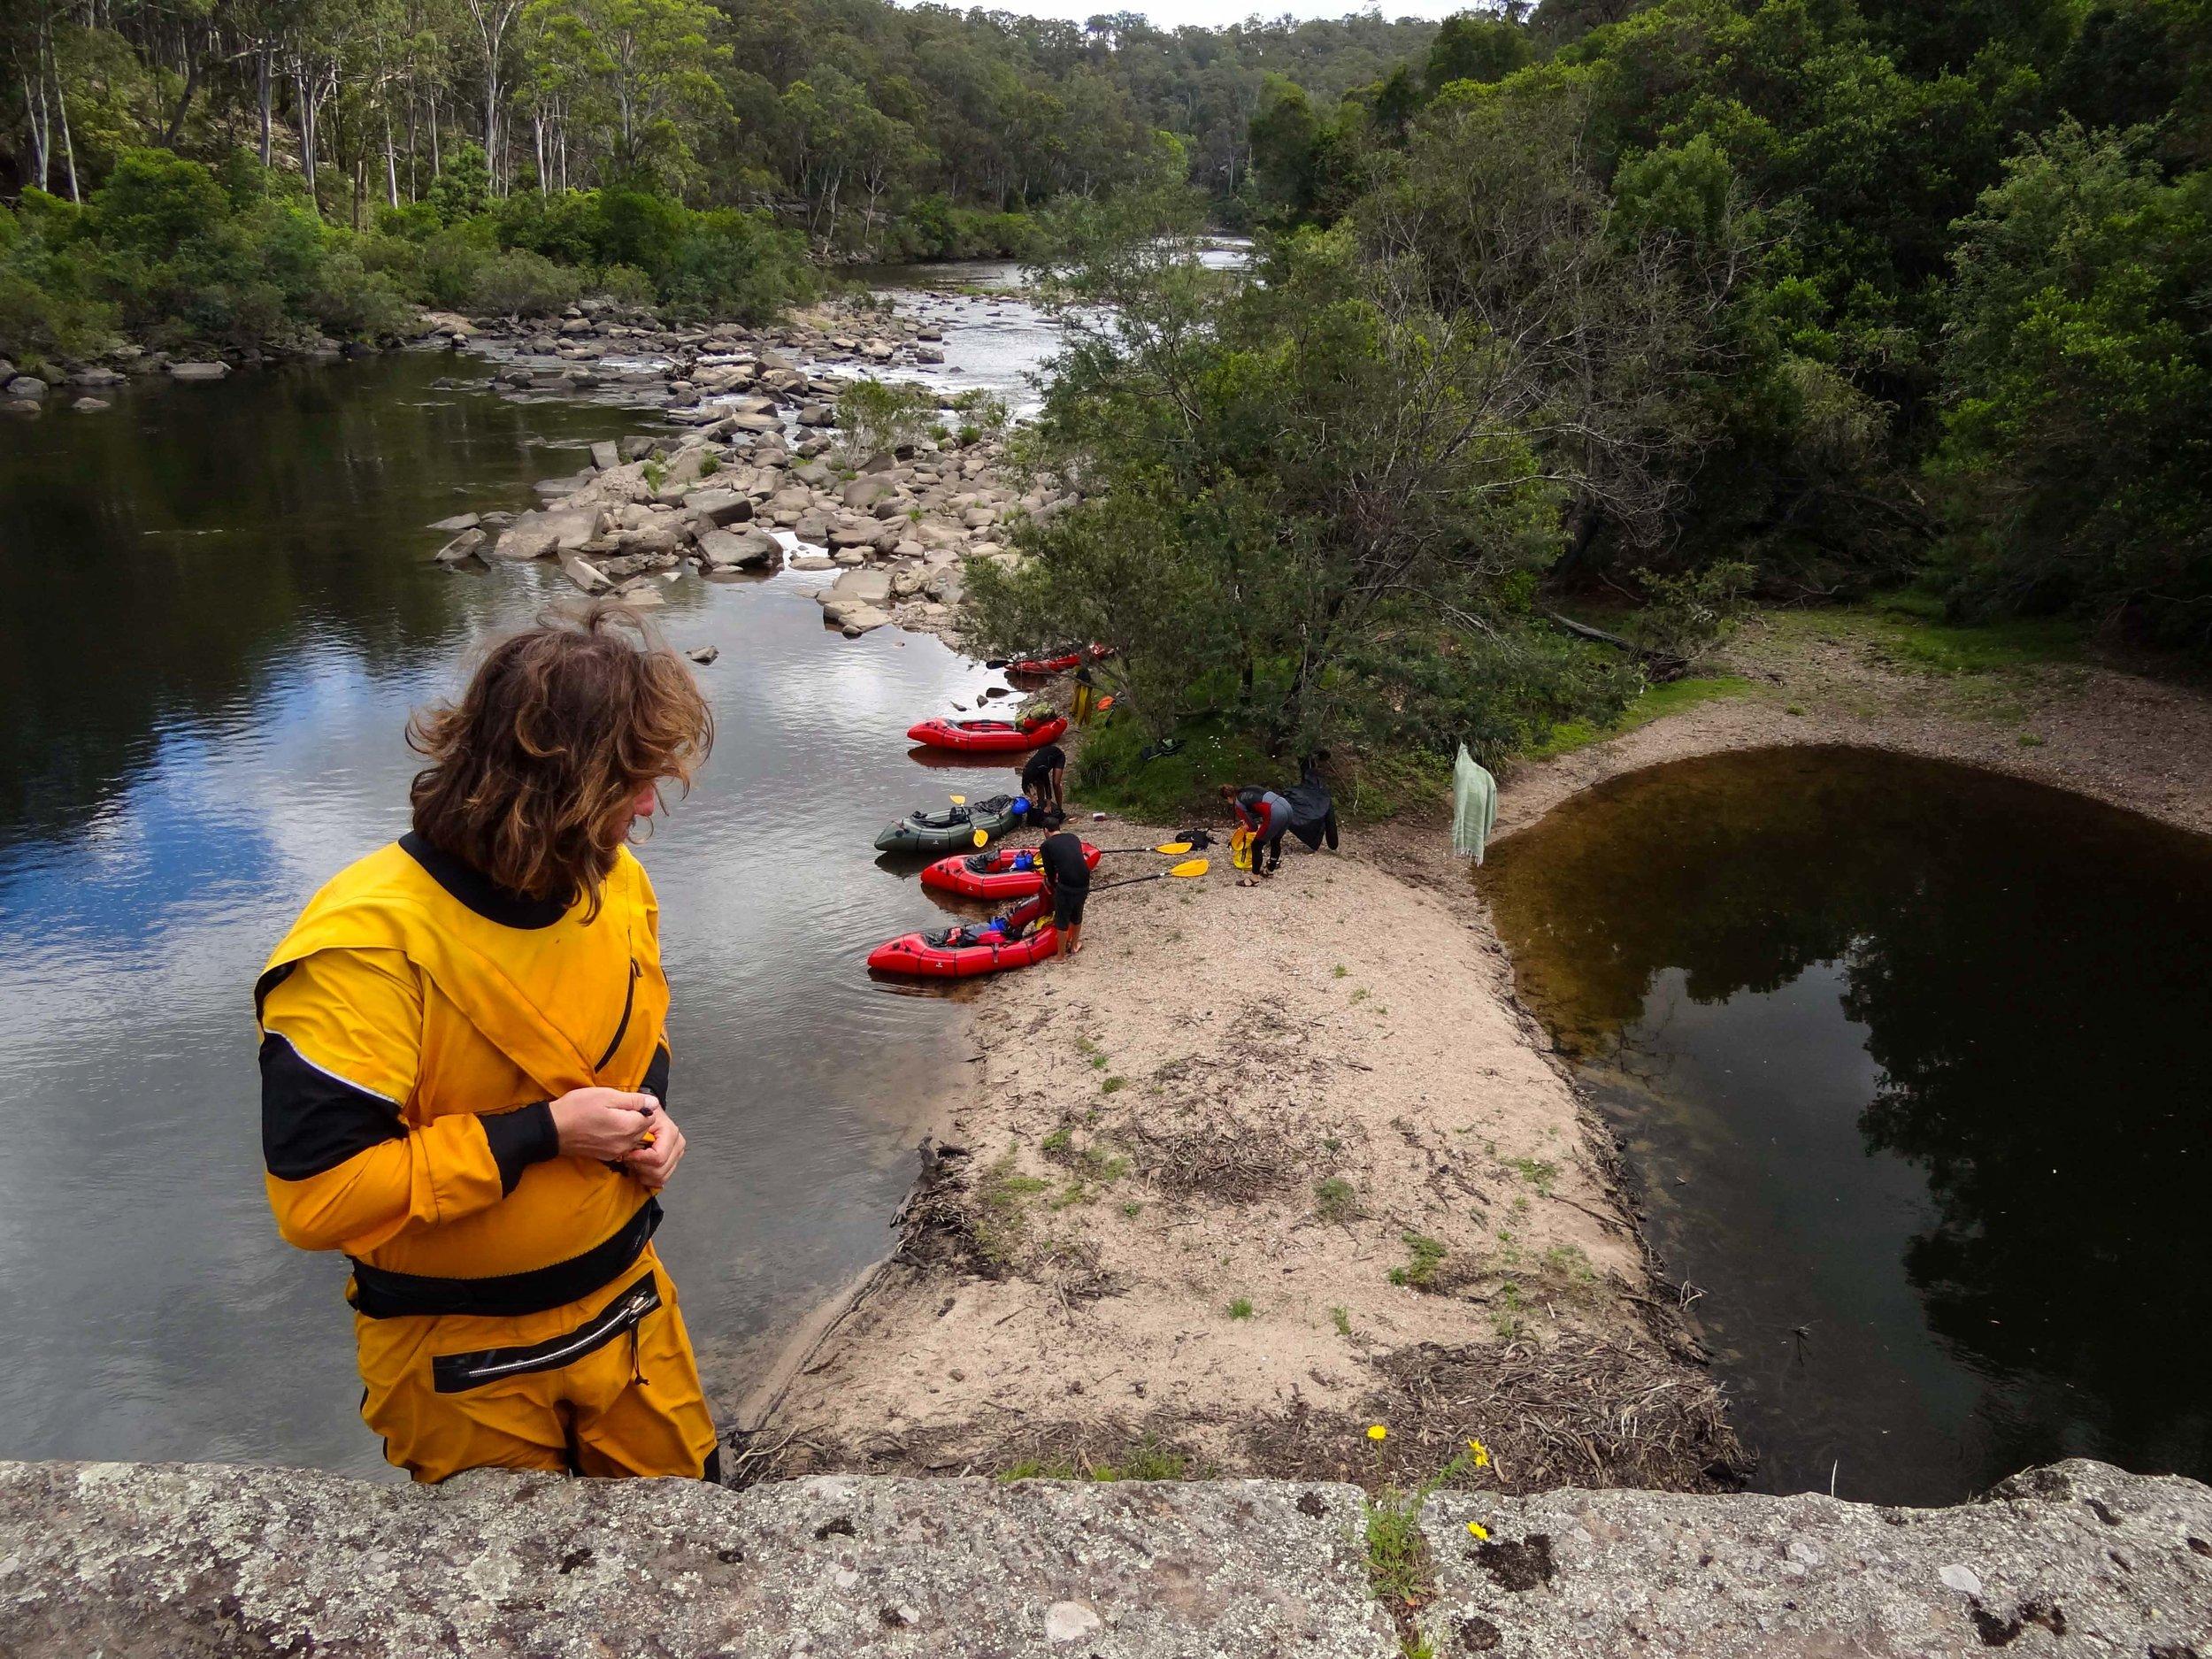 Pack_Raft_Australia_Mitchell_River_Dam_Wall_Alpacka_Raft.jpg